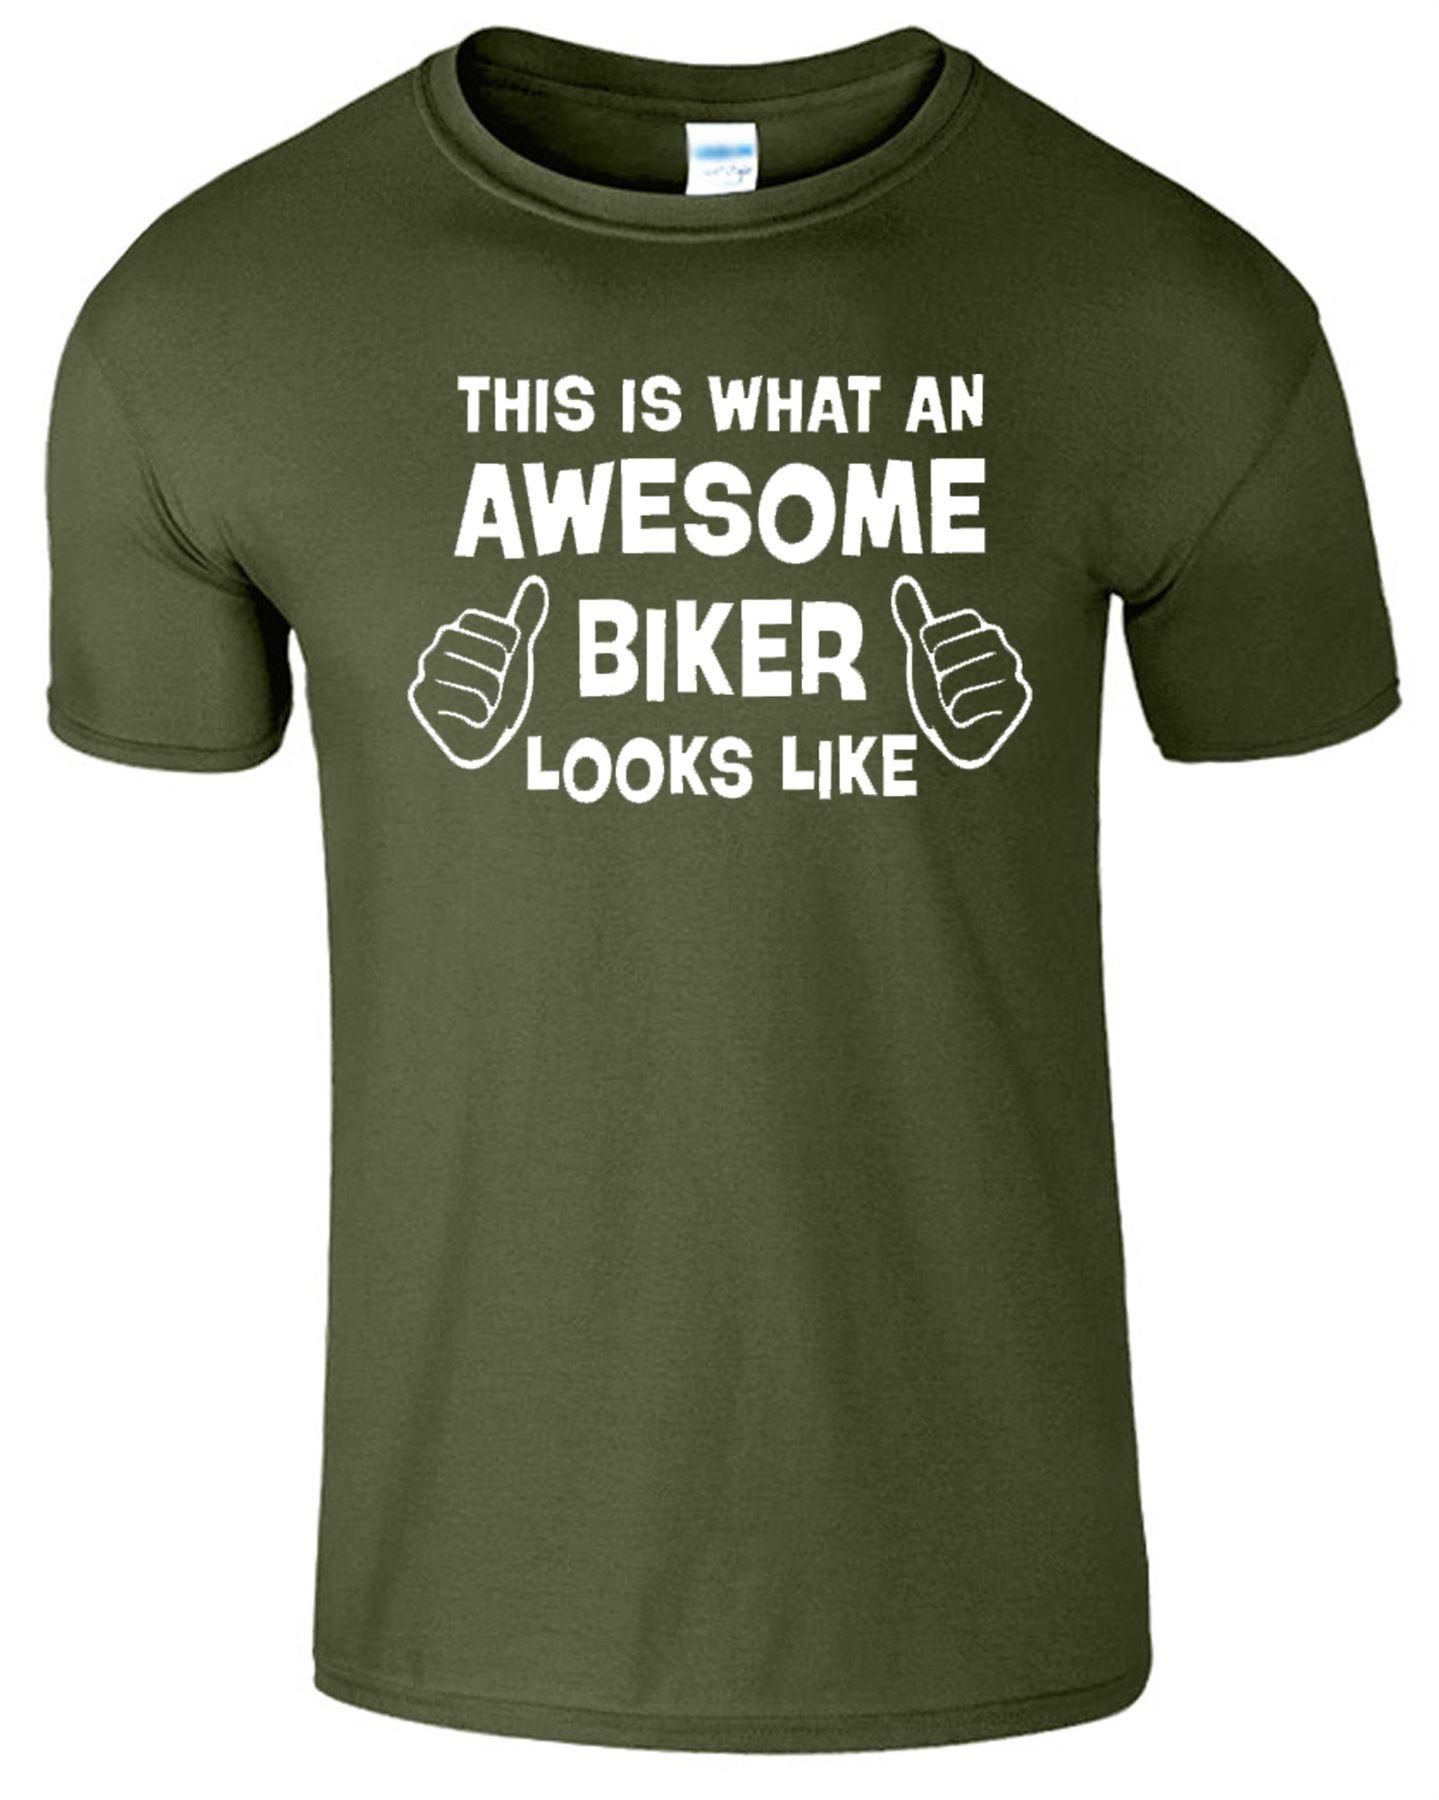 Awesome Biker Mens T-Shirt Motorcycle Rider Gift Birthday Motorbike T Shirt